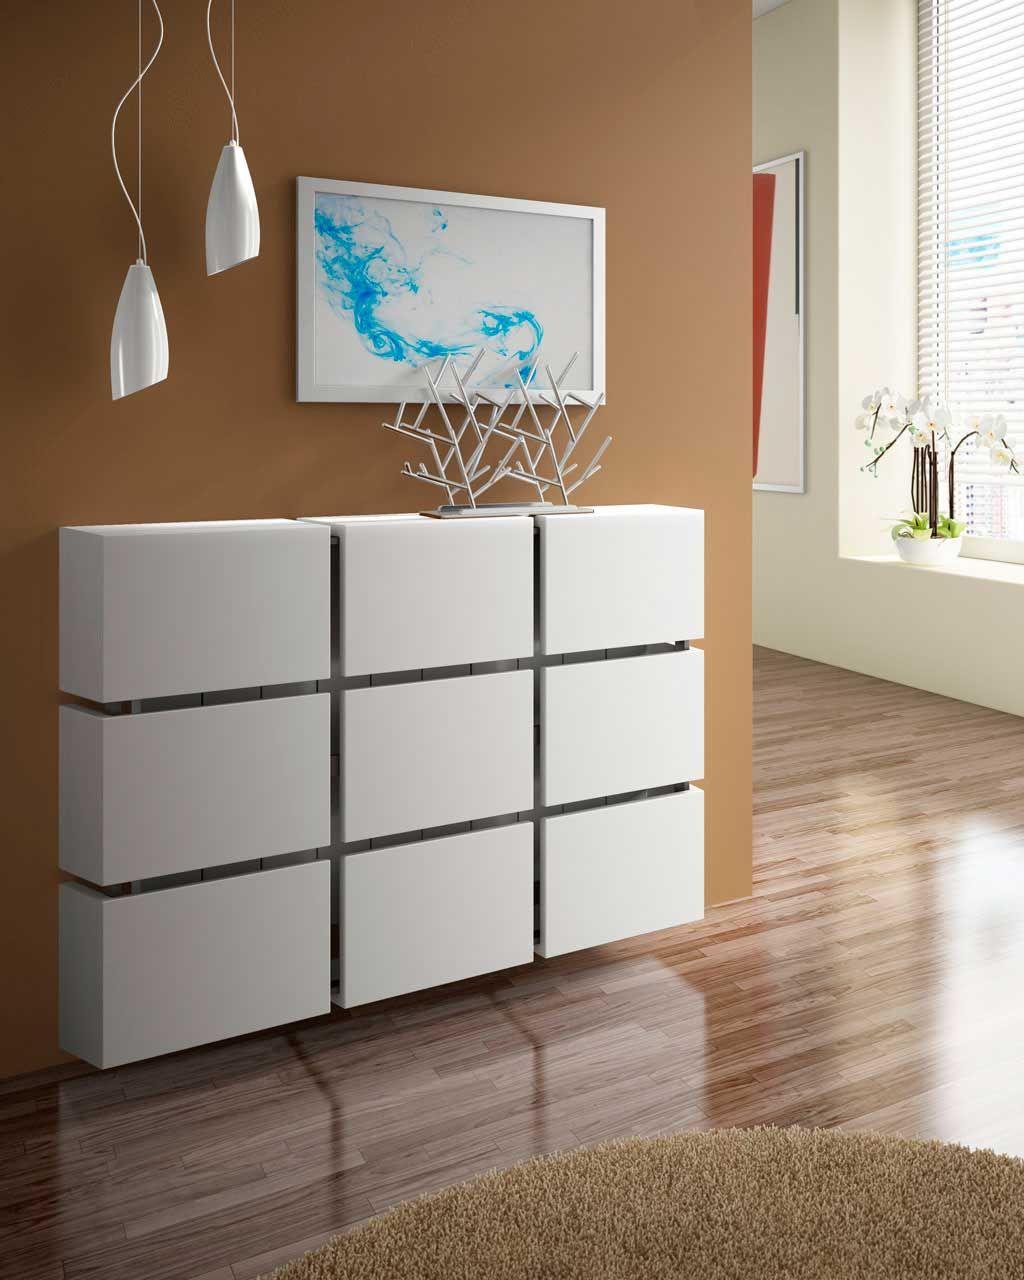 cubreradiadores modernos presupuesto 12h pinterest cache. Black Bedroom Furniture Sets. Home Design Ideas